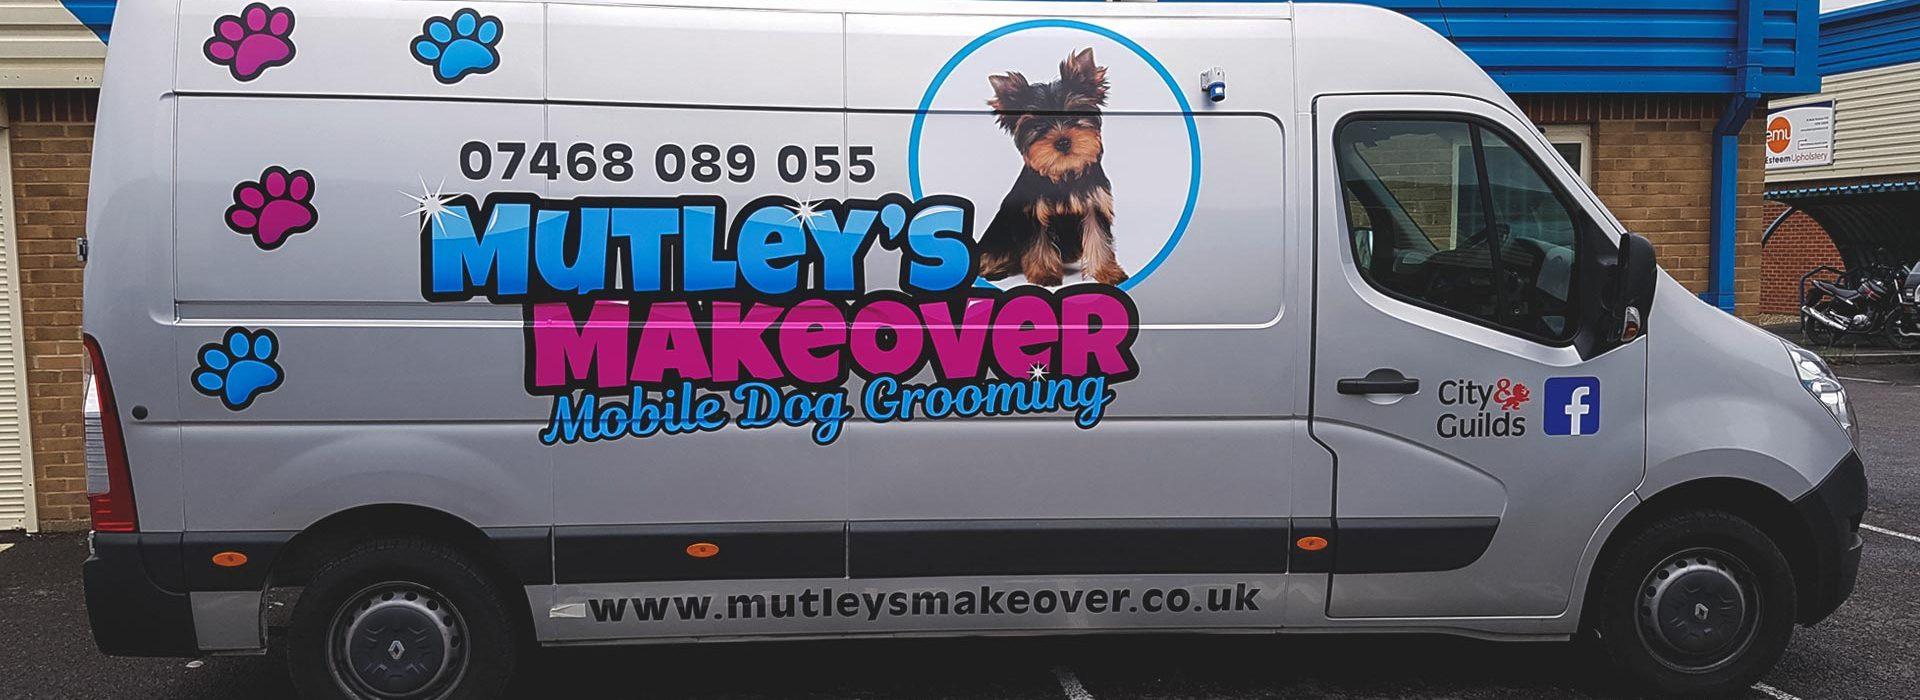 Portfolio - Mutley's Makeover - Vehicle Wrap